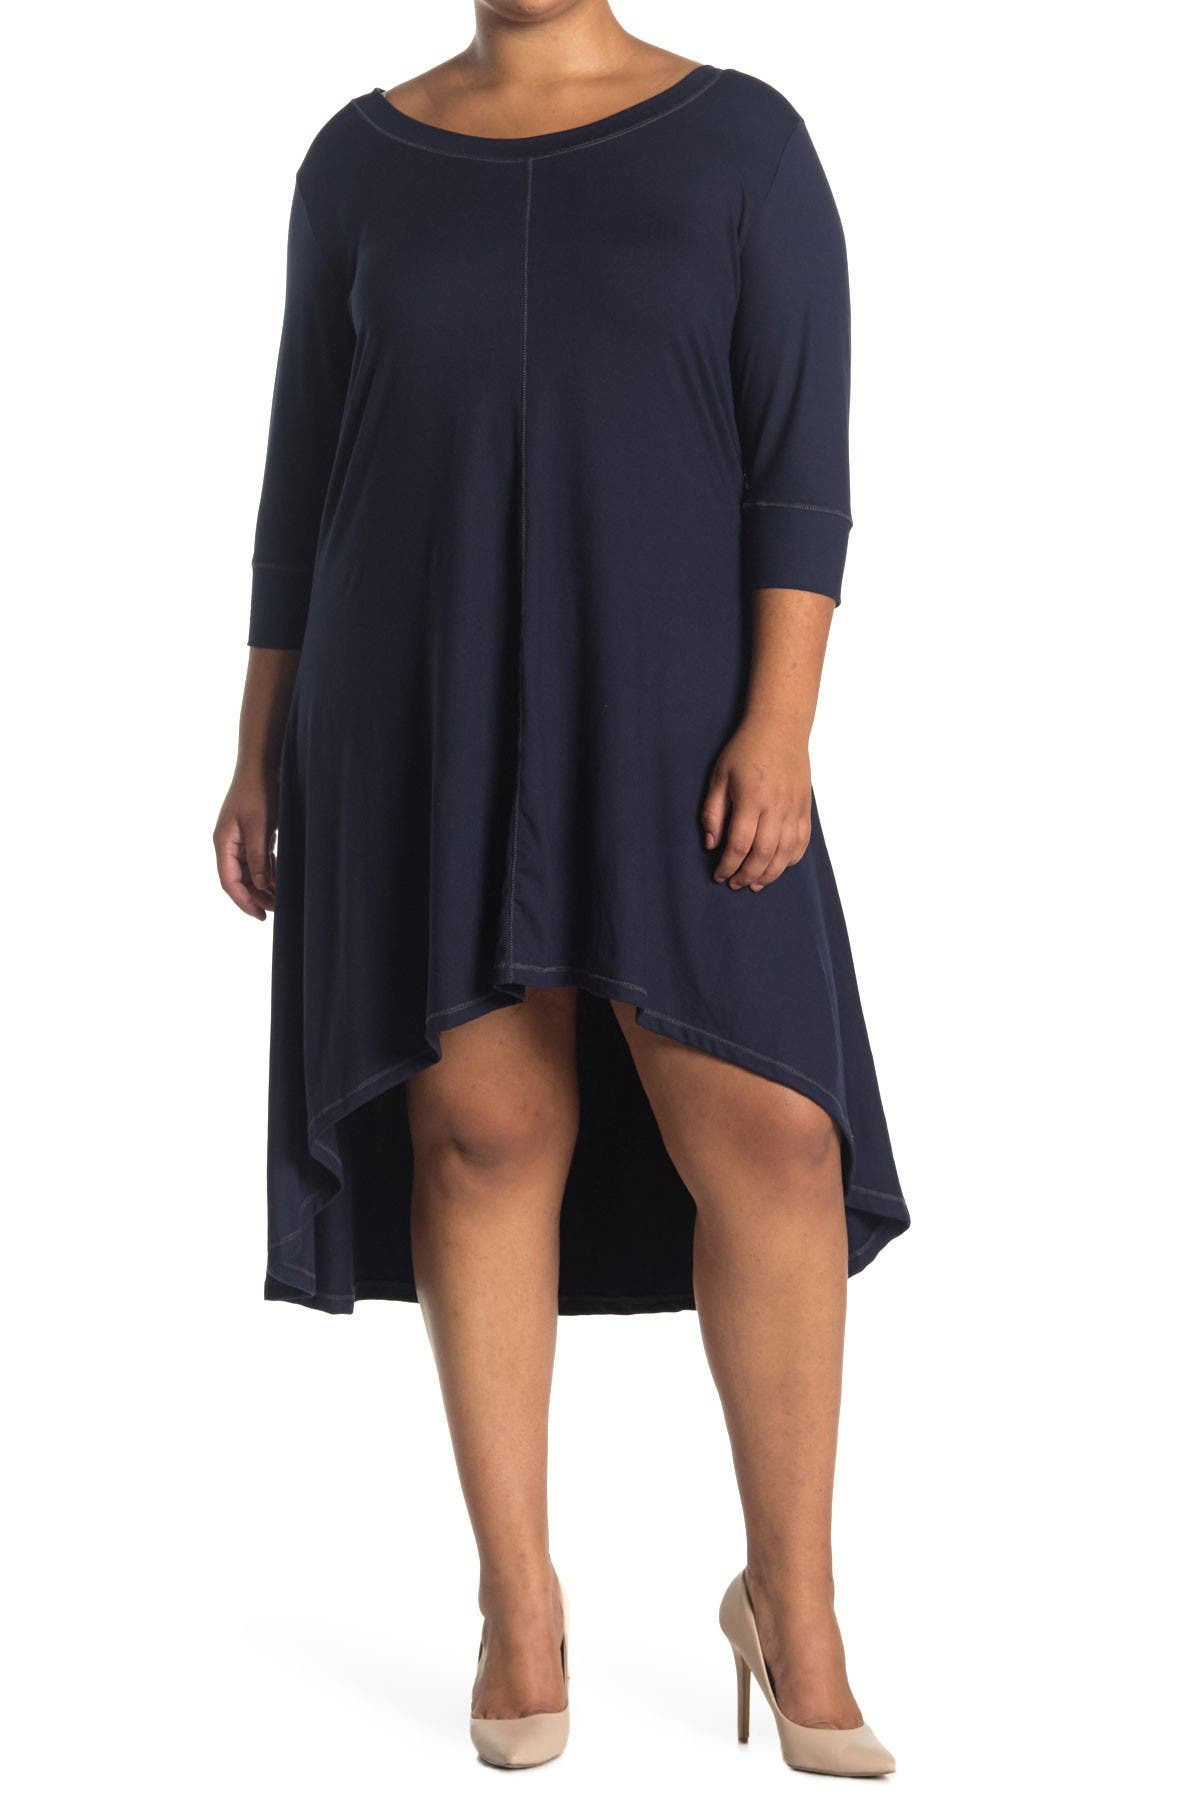 Image of Forgotten Grace 3/4 Sleeve Hi-Lo Knit Dress